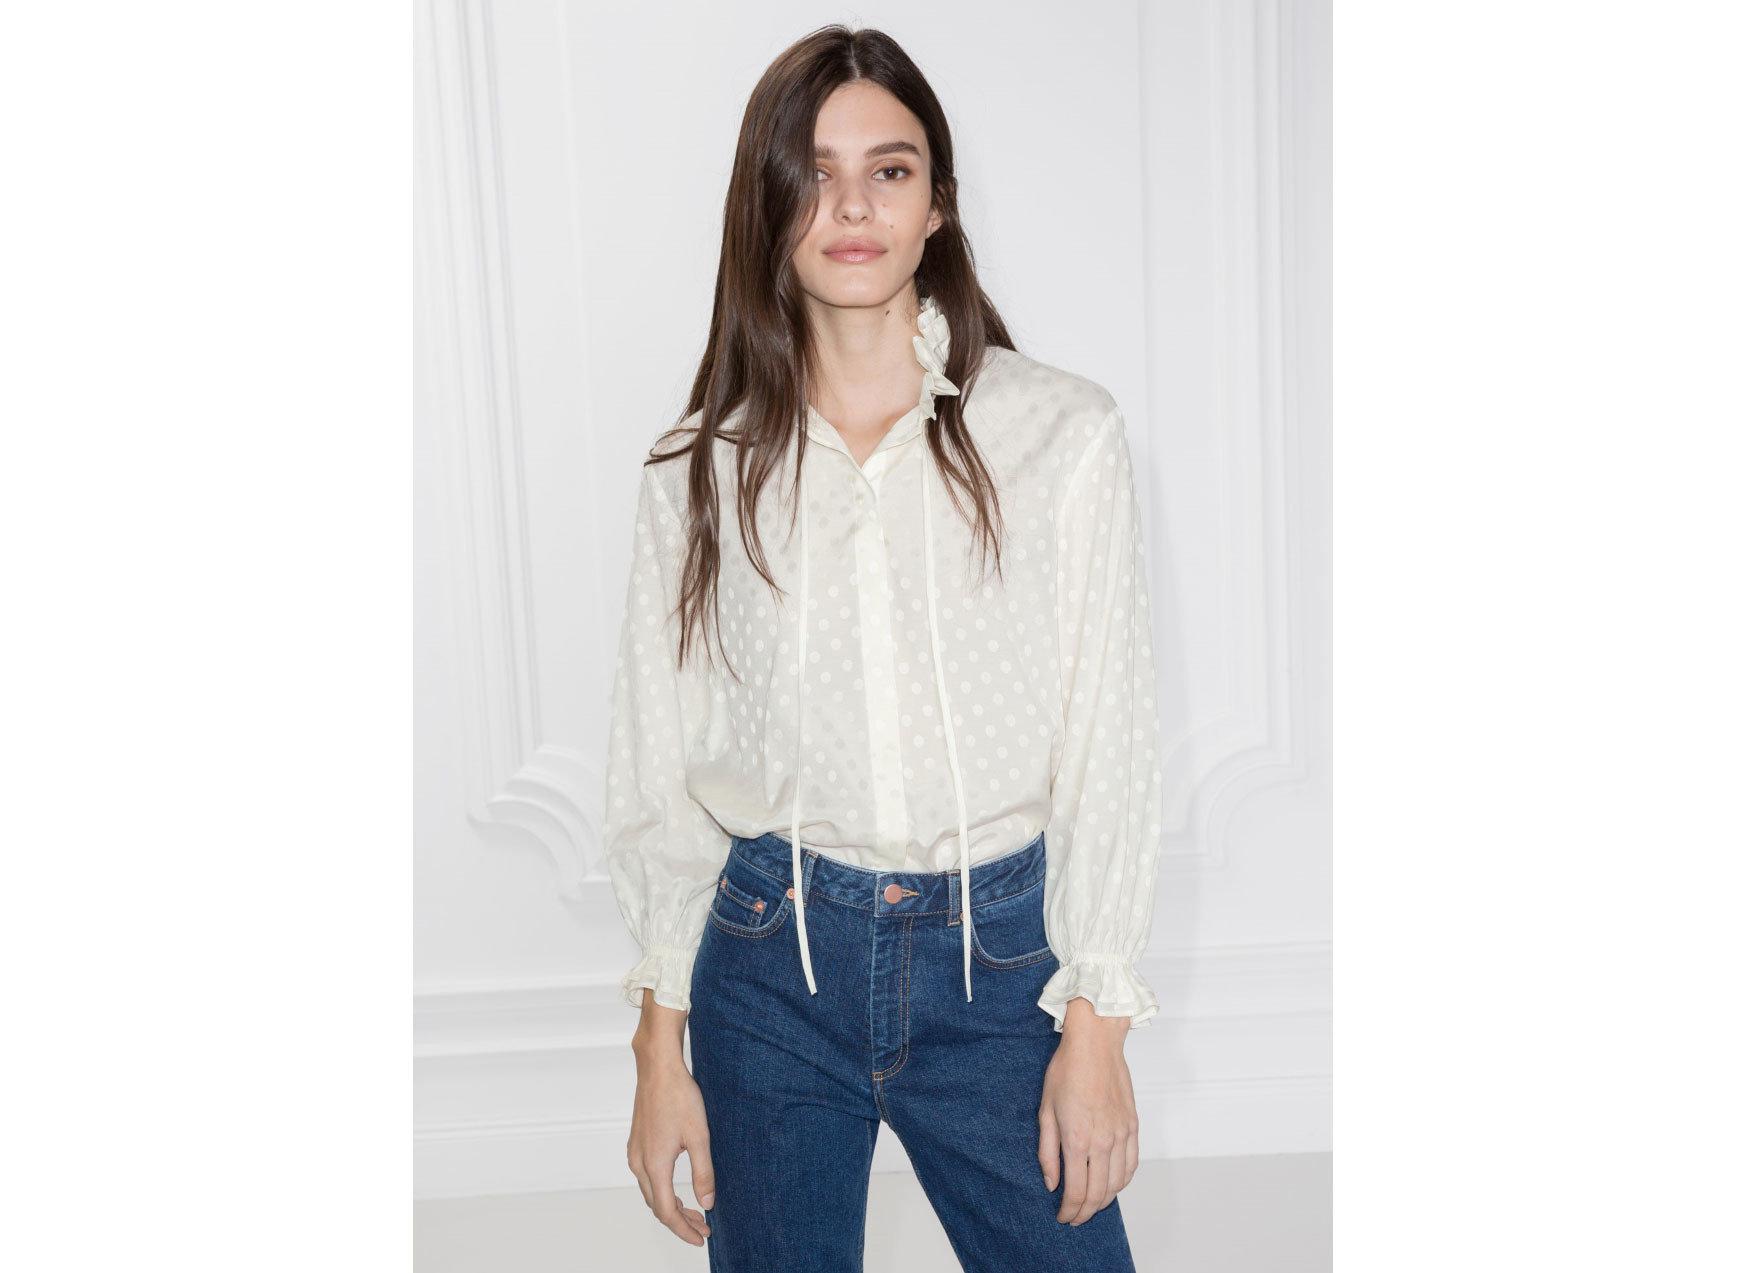 Style + Design Travel Shop person clothing posing fashion model standing sleeve shoulder jeans neck denim long hair blouse supermodel top model shirt button trouser